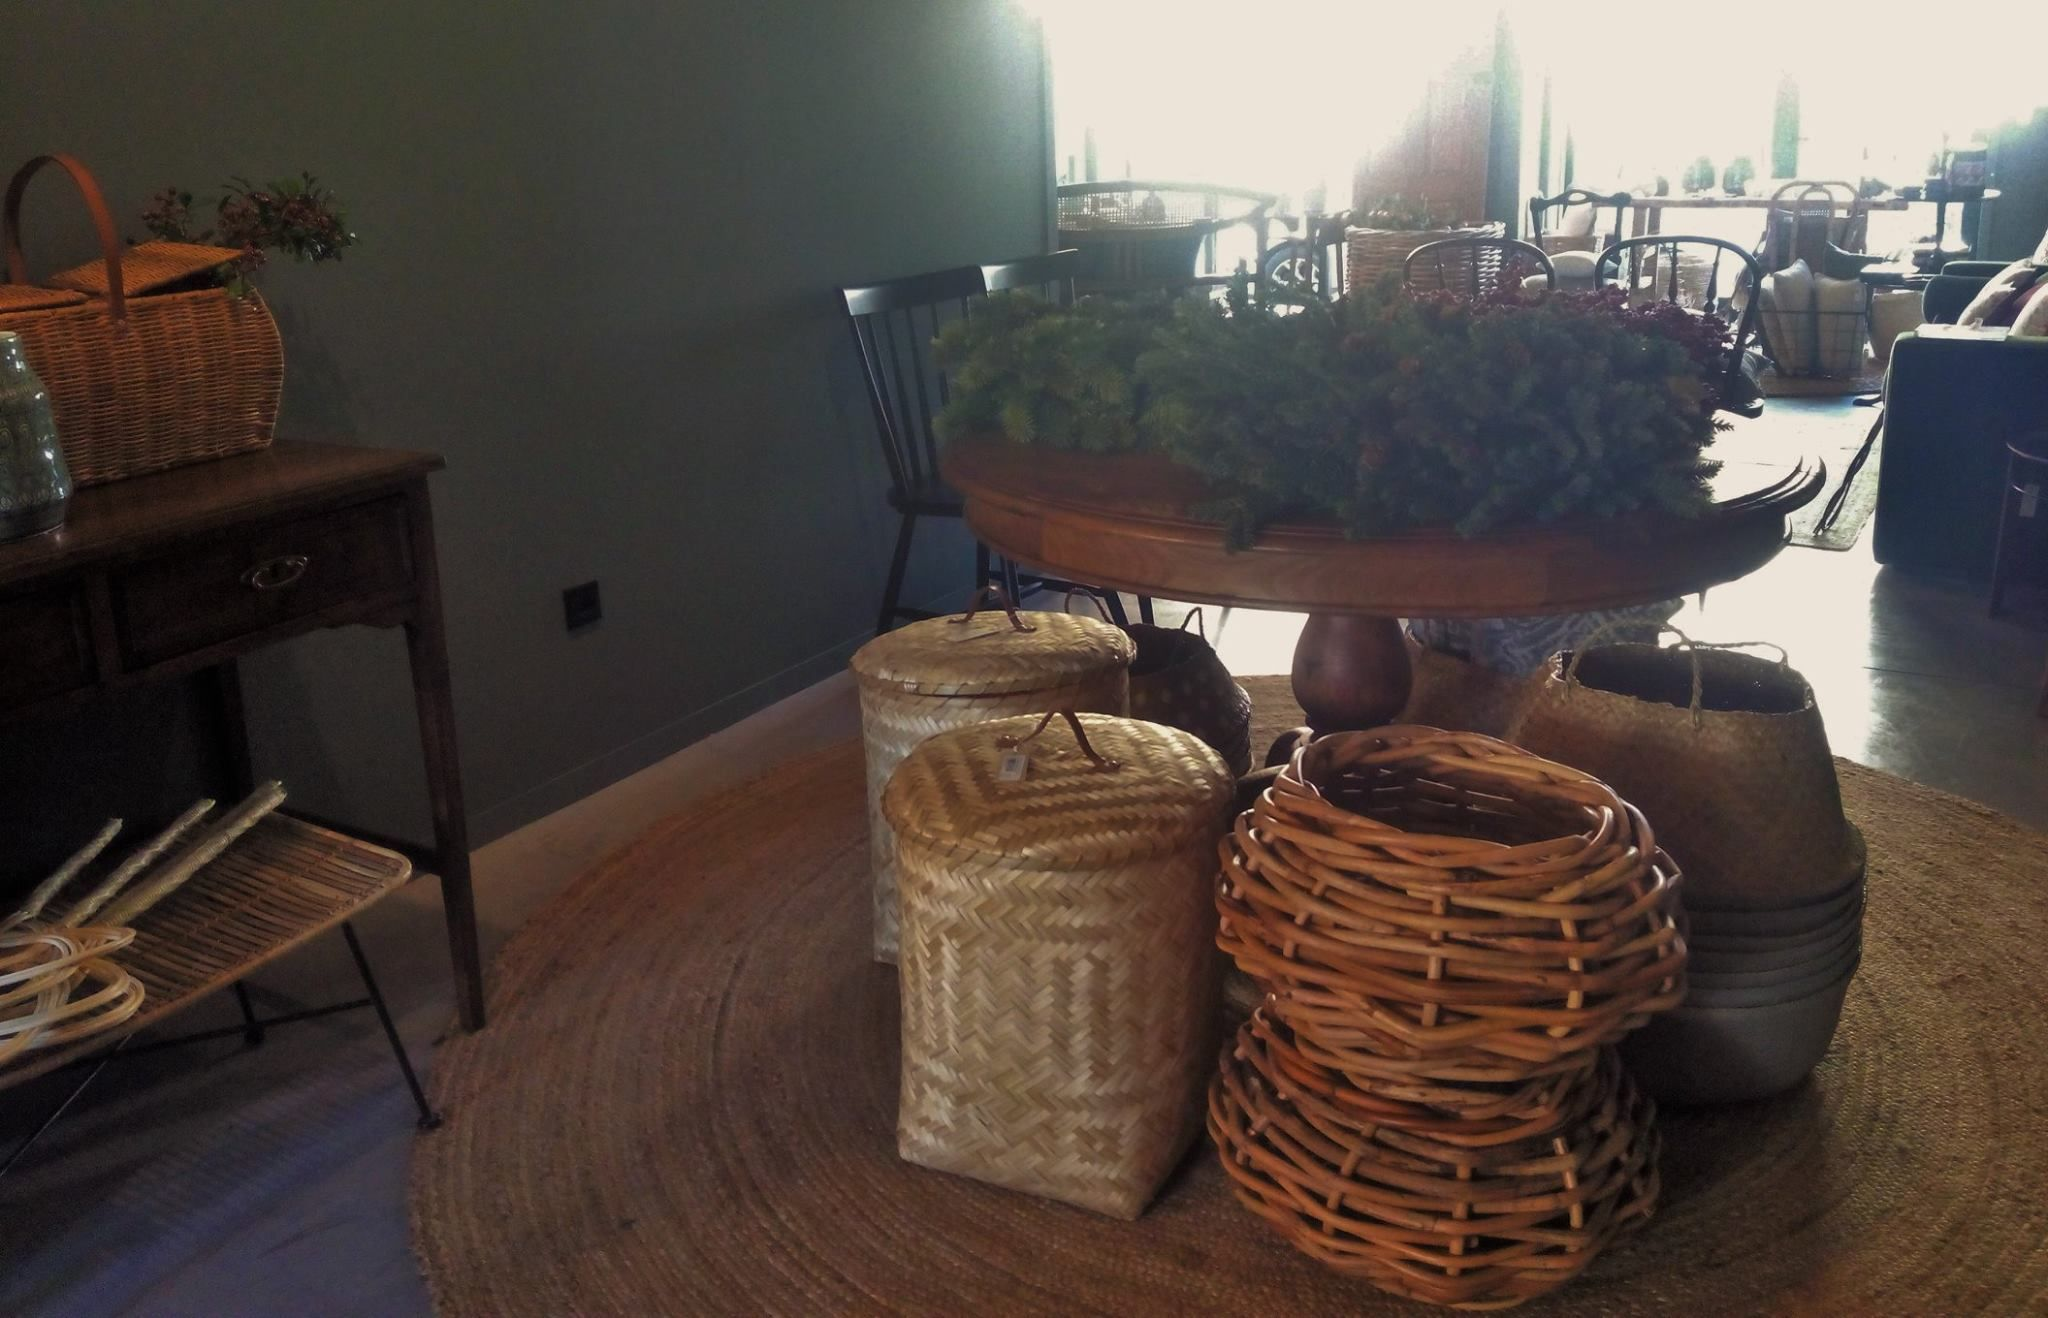 #mercadoloftstore #mls #umseisum #mesa #table #madeira #wood #pedegalo #tradicional #cesto #cestos #picnic #coroa #batedordetapetes #tapete #decorpieces